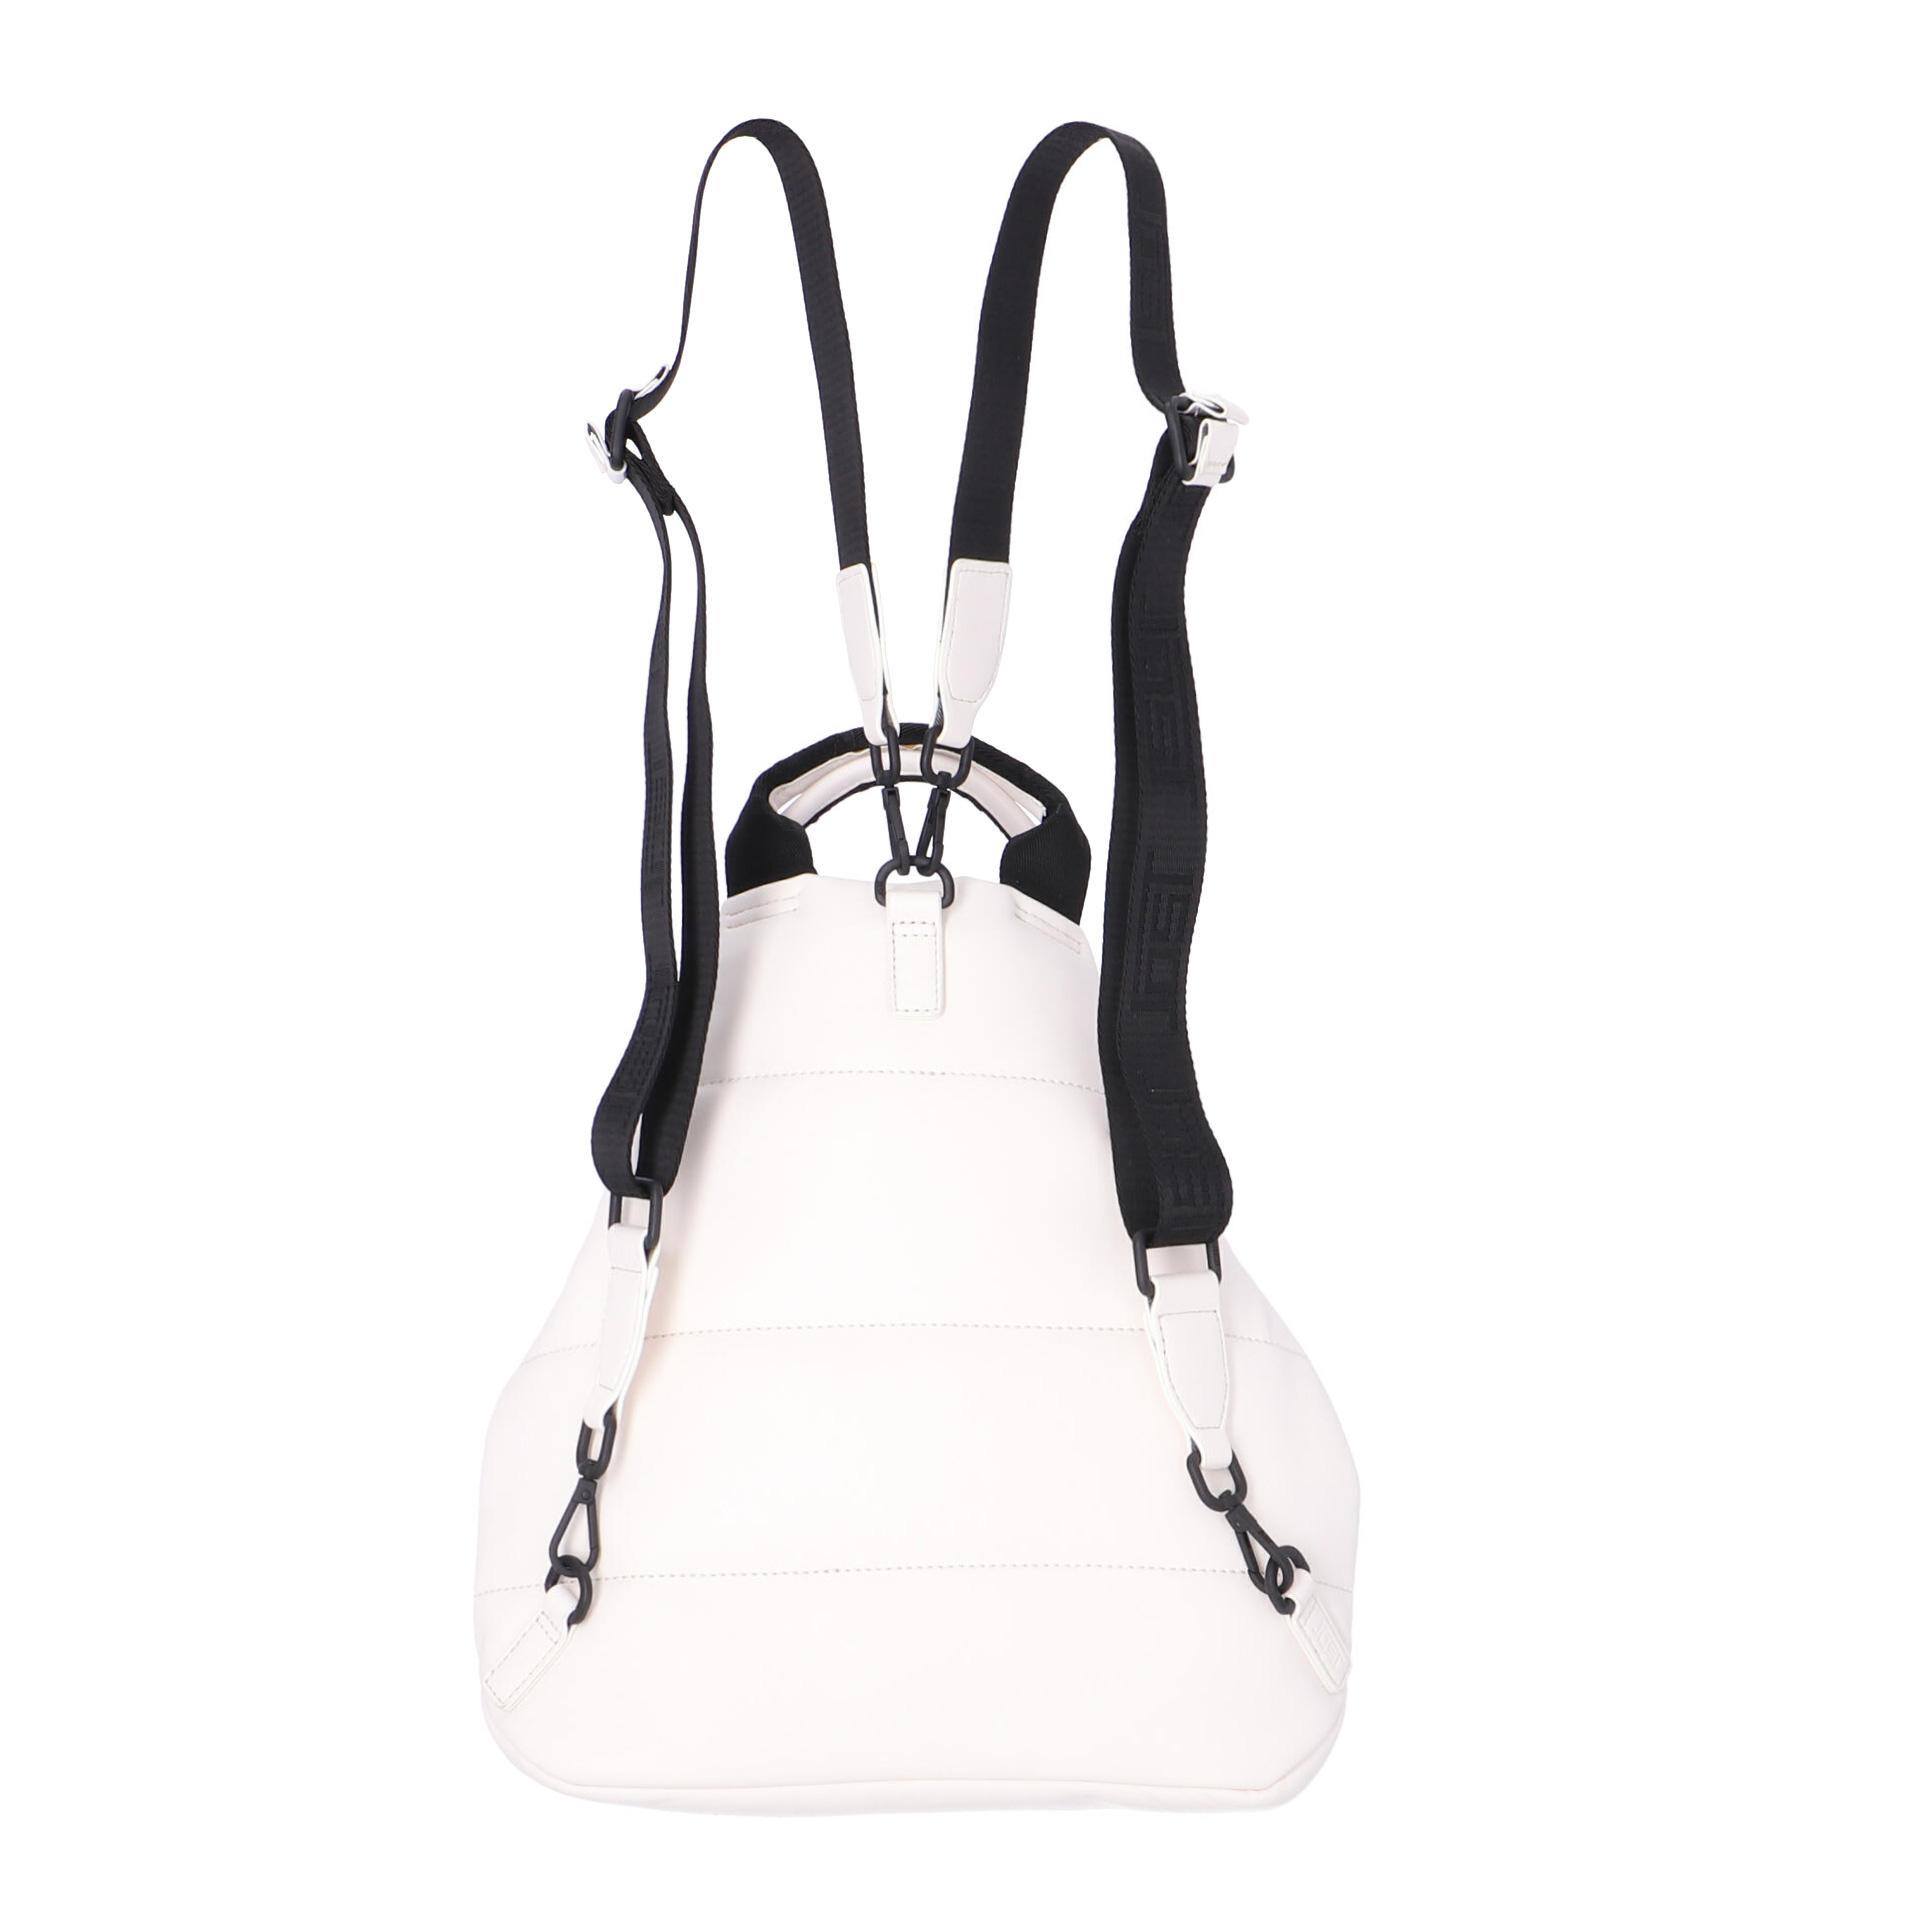 Jost Kaarina X-Change Bag XS aus Recycling Material offwhite